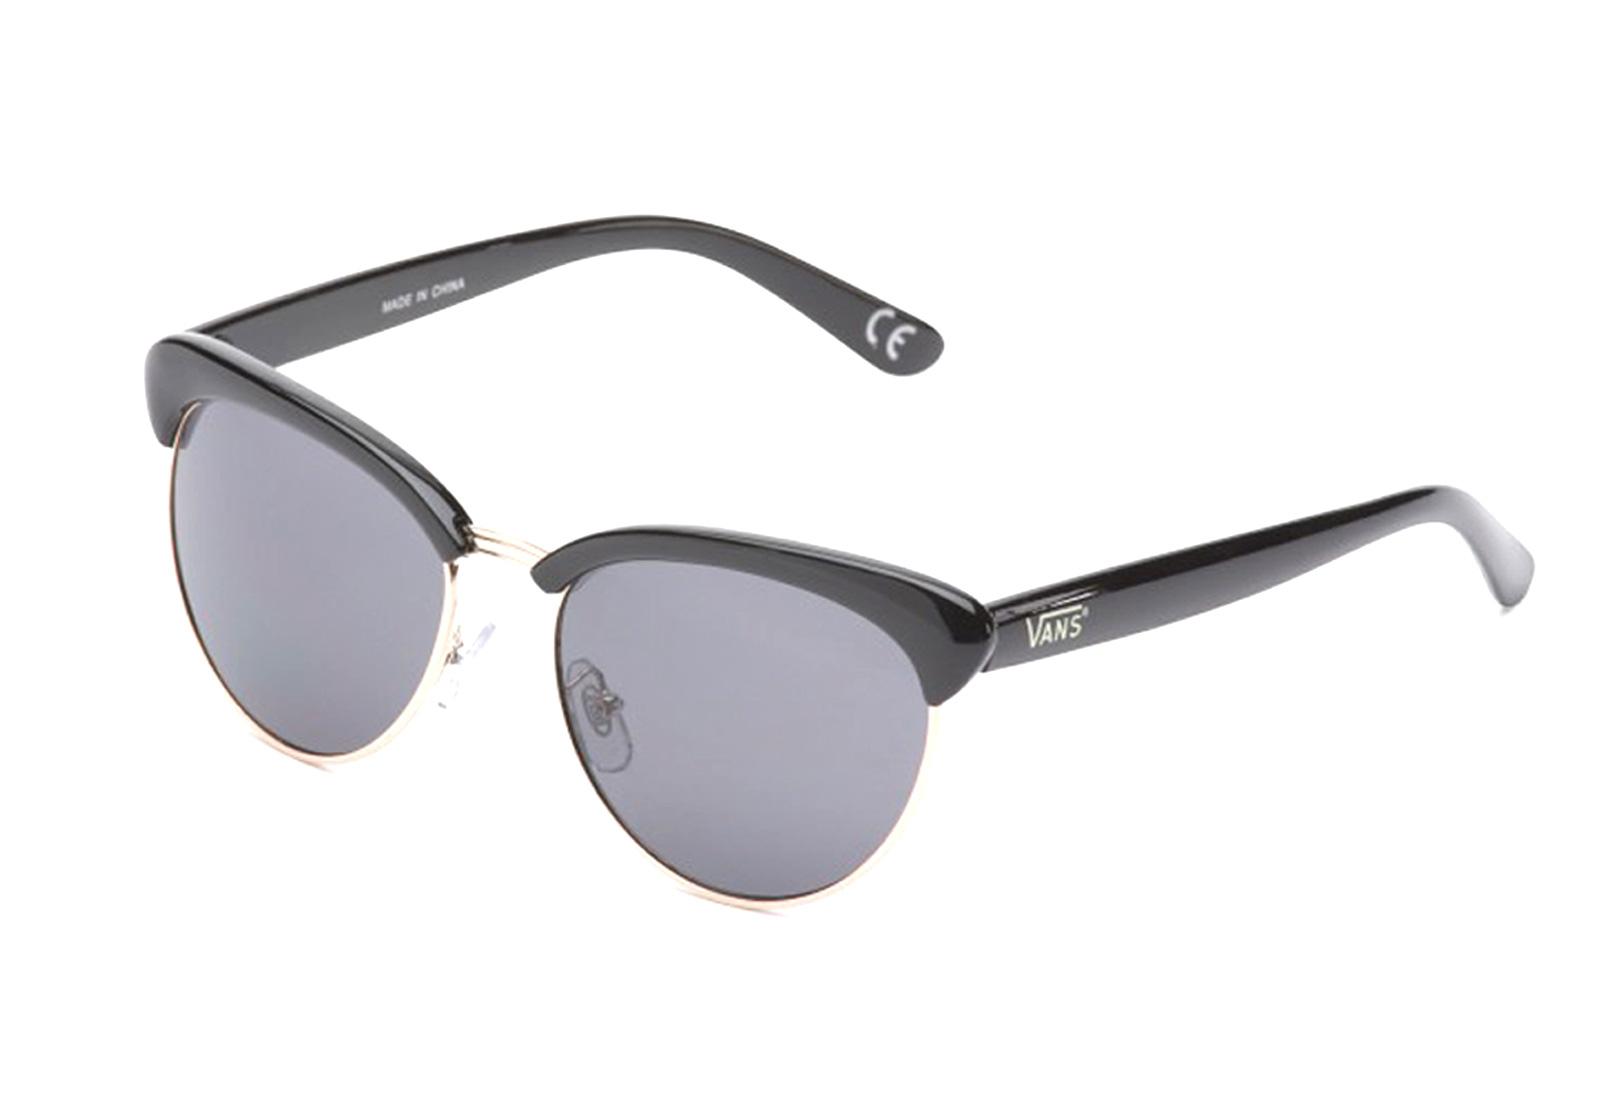 Vans Naočare Semirimless cat sunglasses